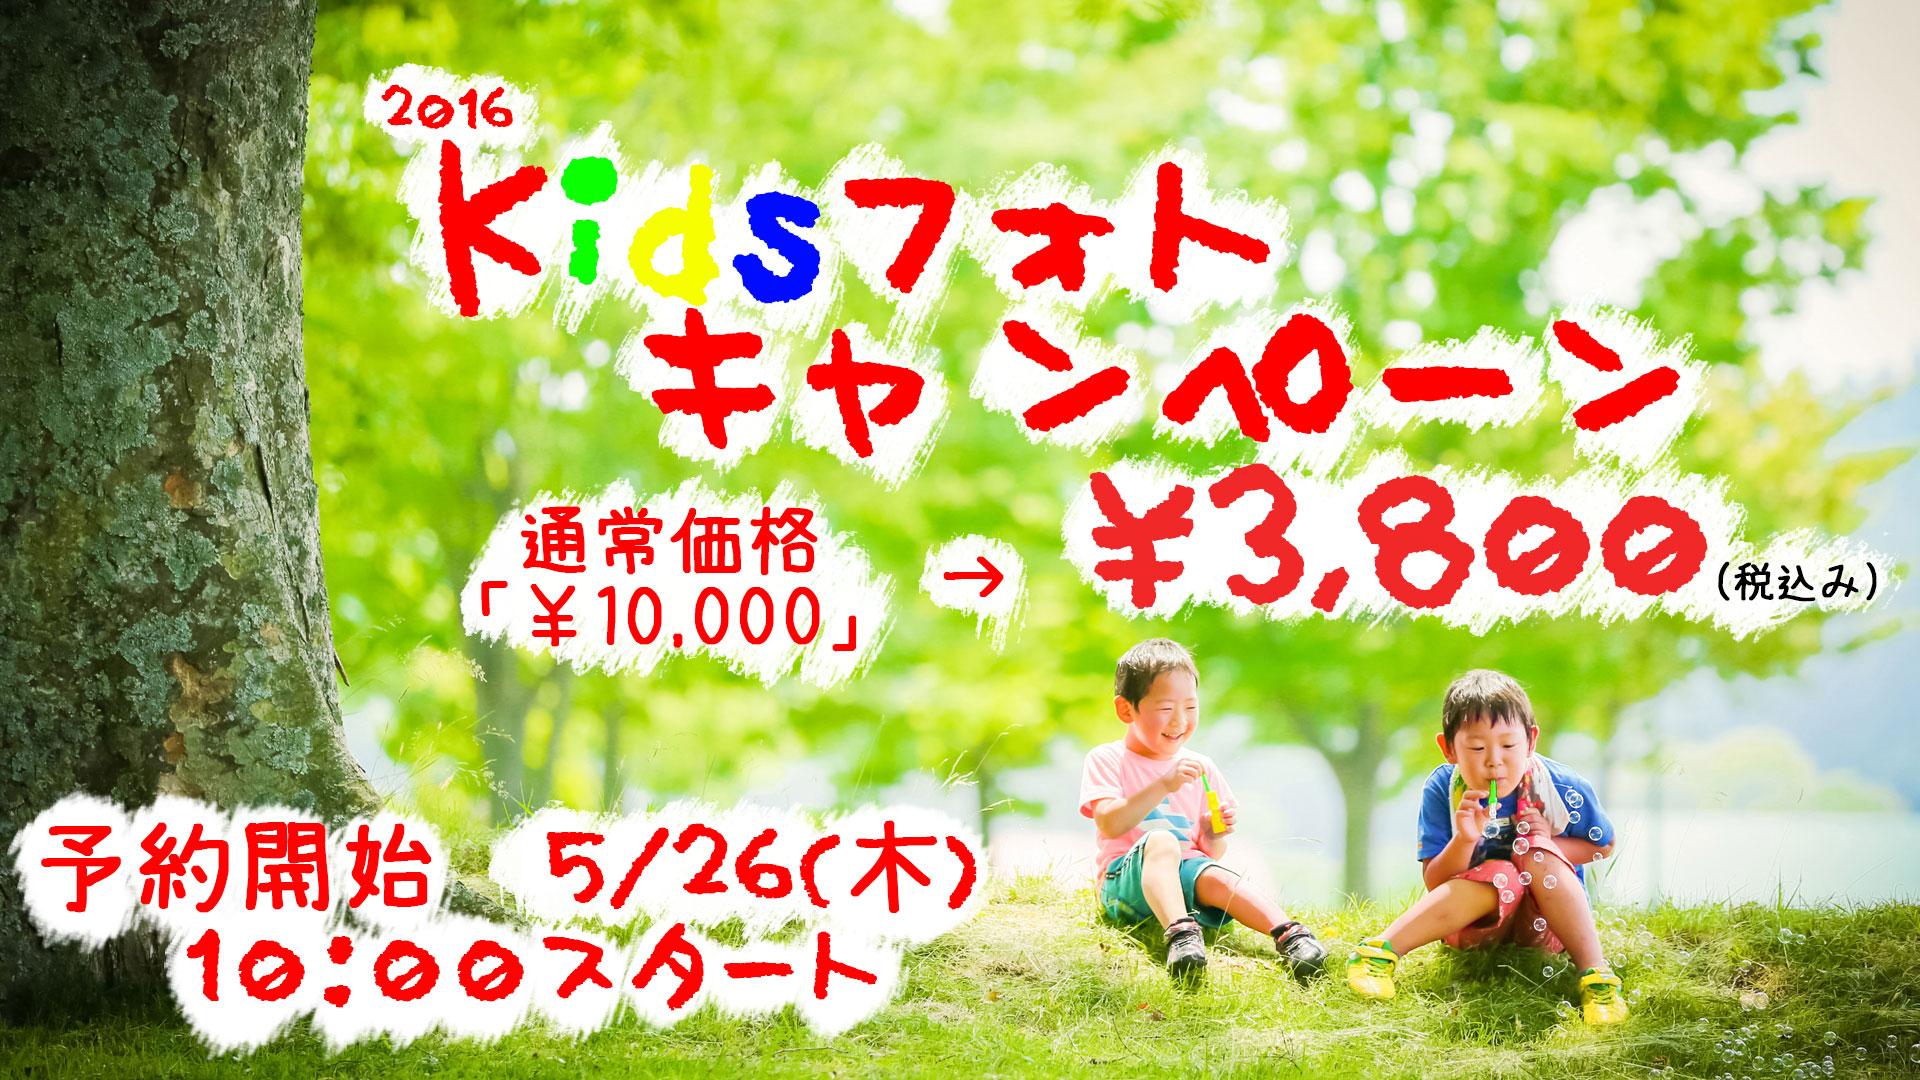 2016 kidsフォトキャンペーン